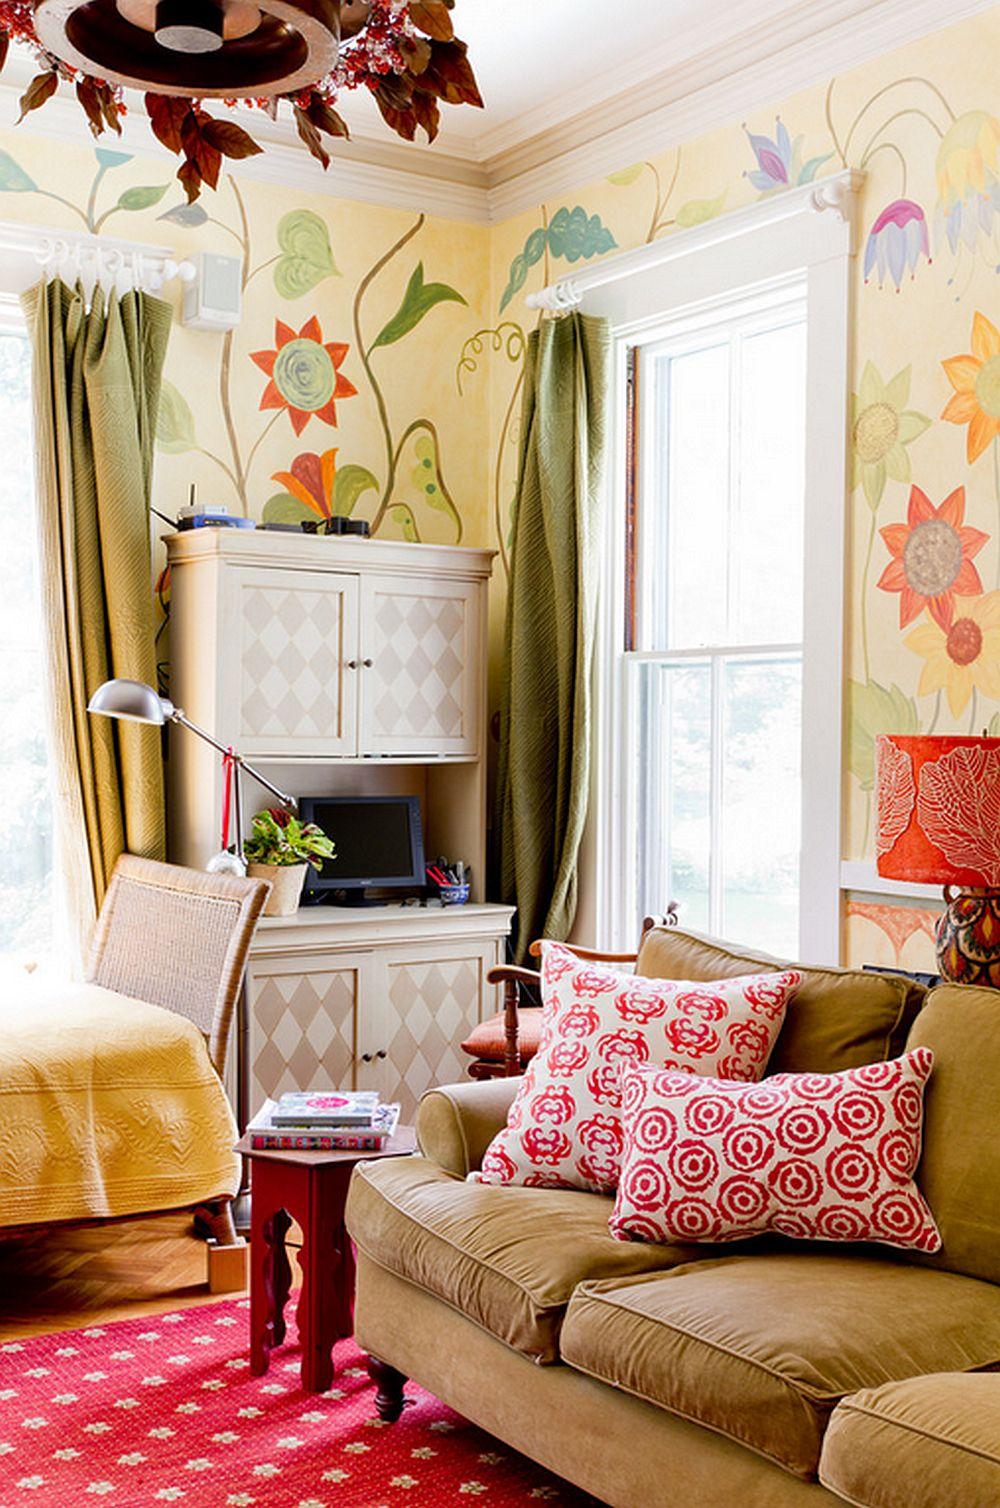 adelaparvu.com despre casa veche de artisti din Boston cu pereti pictati cu flori, Foto Rikki Snyder (3)